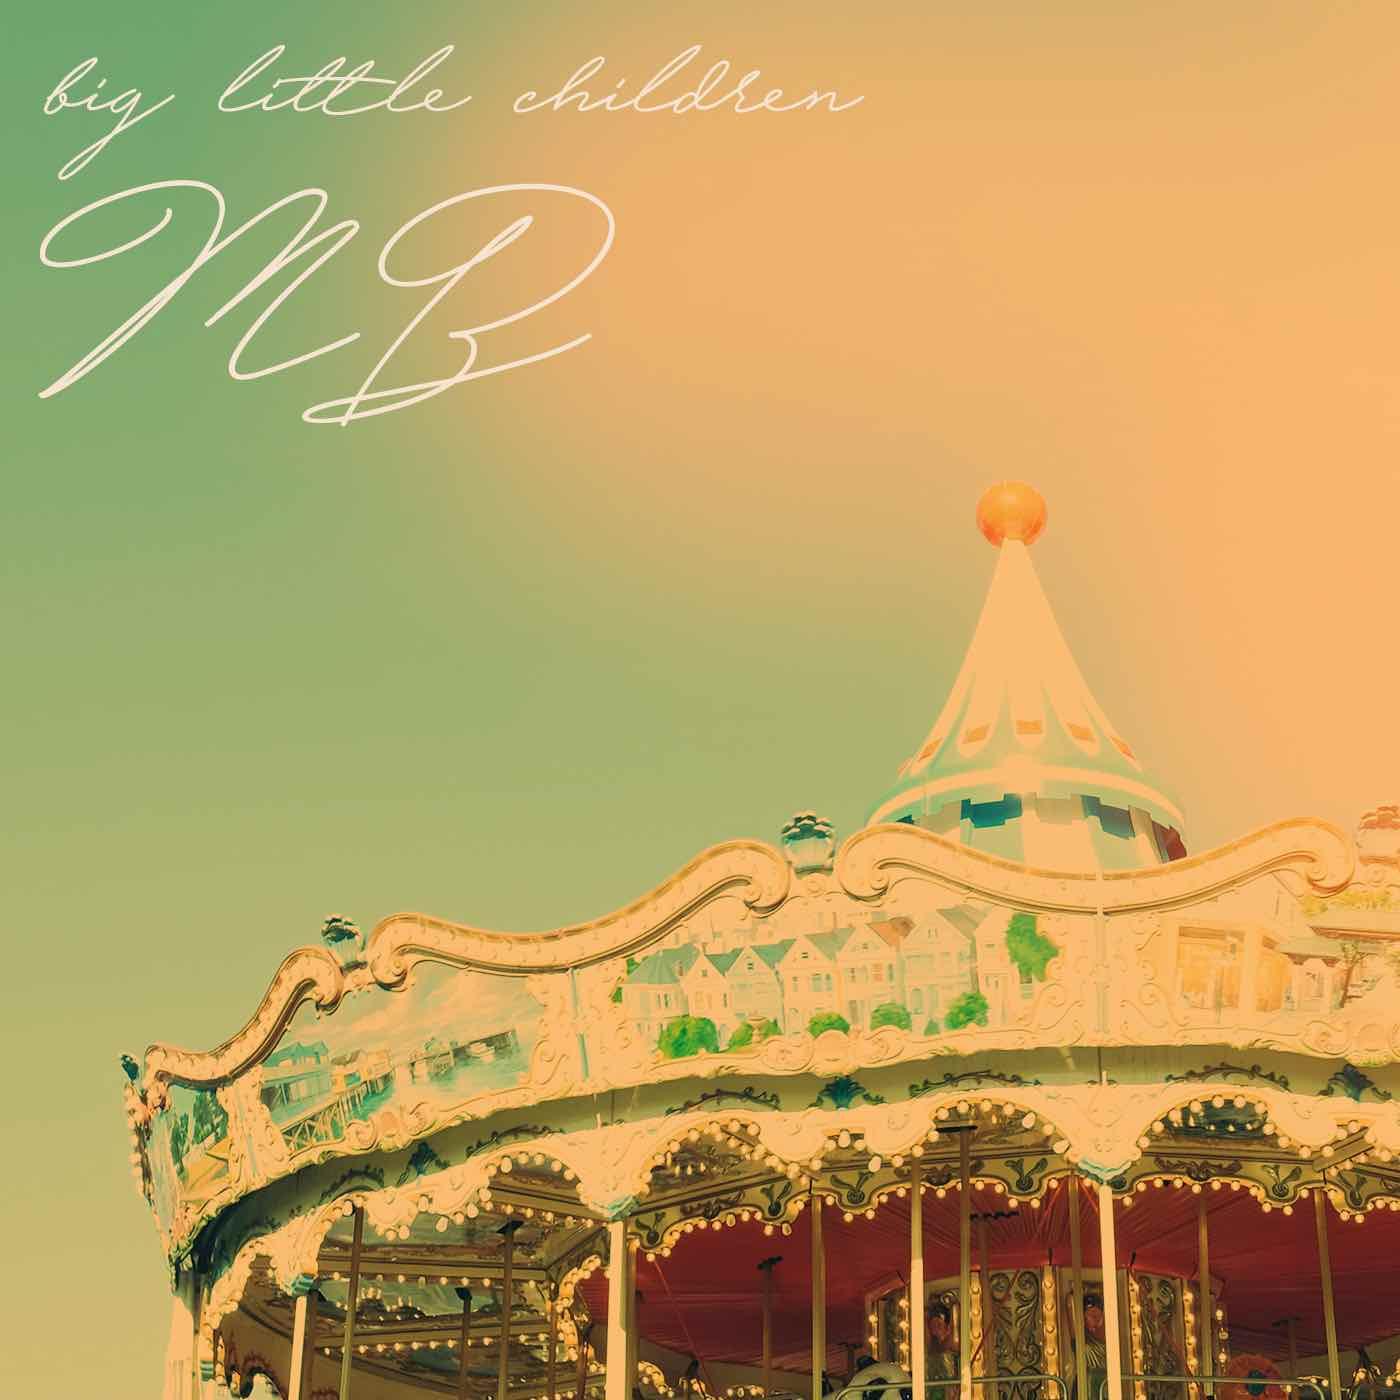 Big-Little-Children-MB